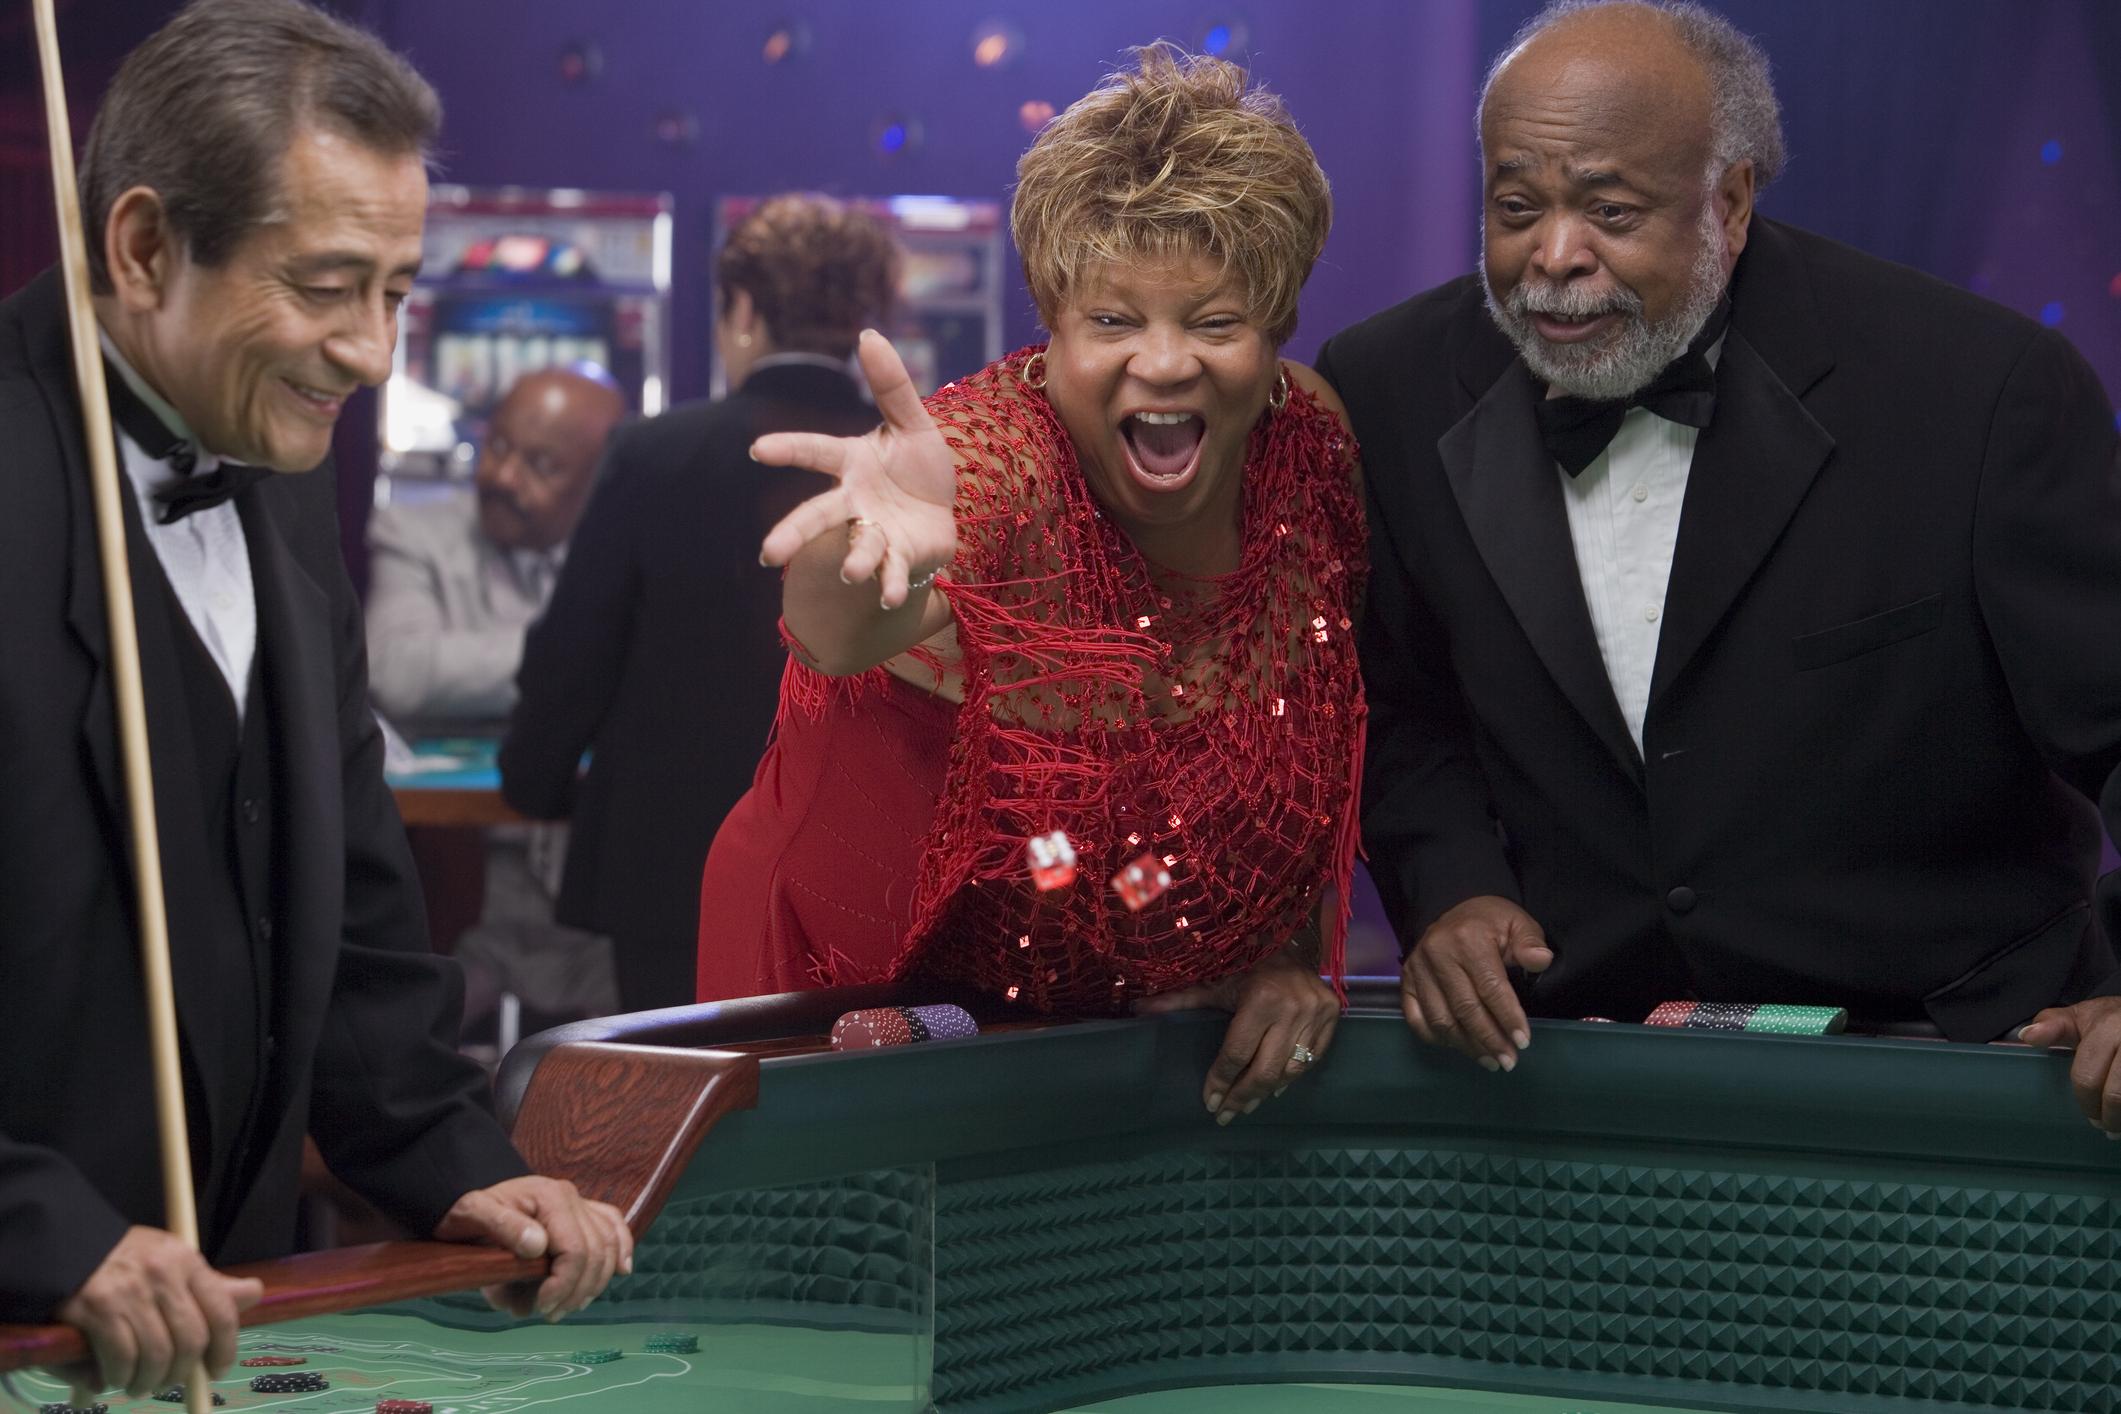 Elderly couple playing craps